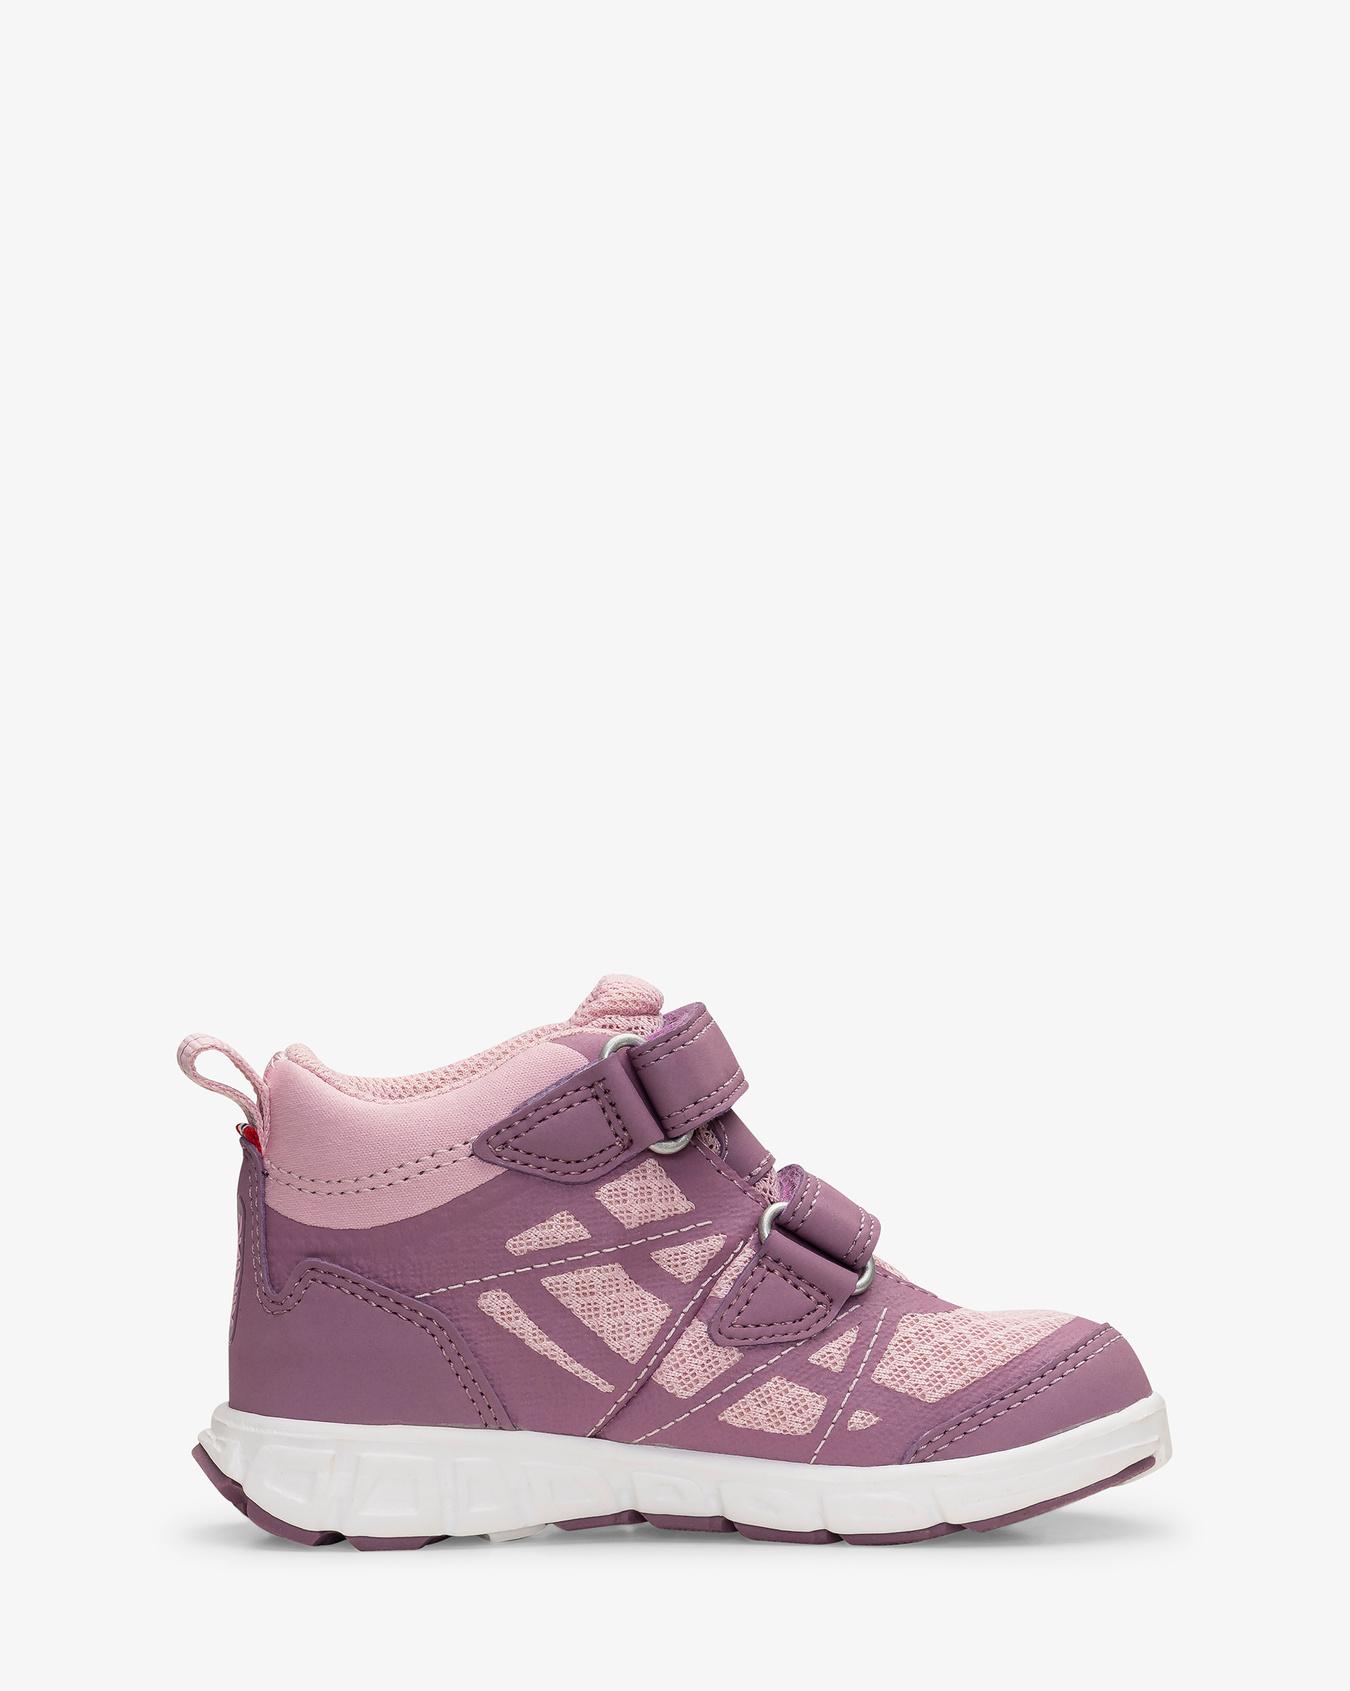 Veme Mid GTX Sneaker